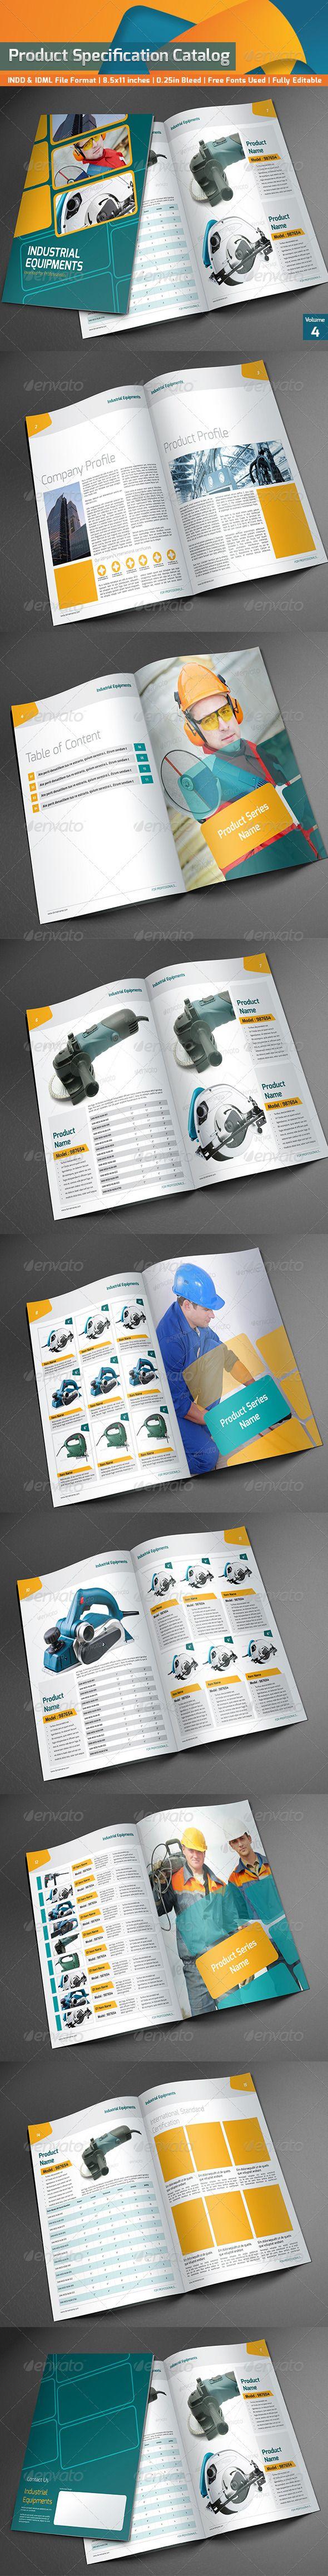 Product Specification Catalog V4